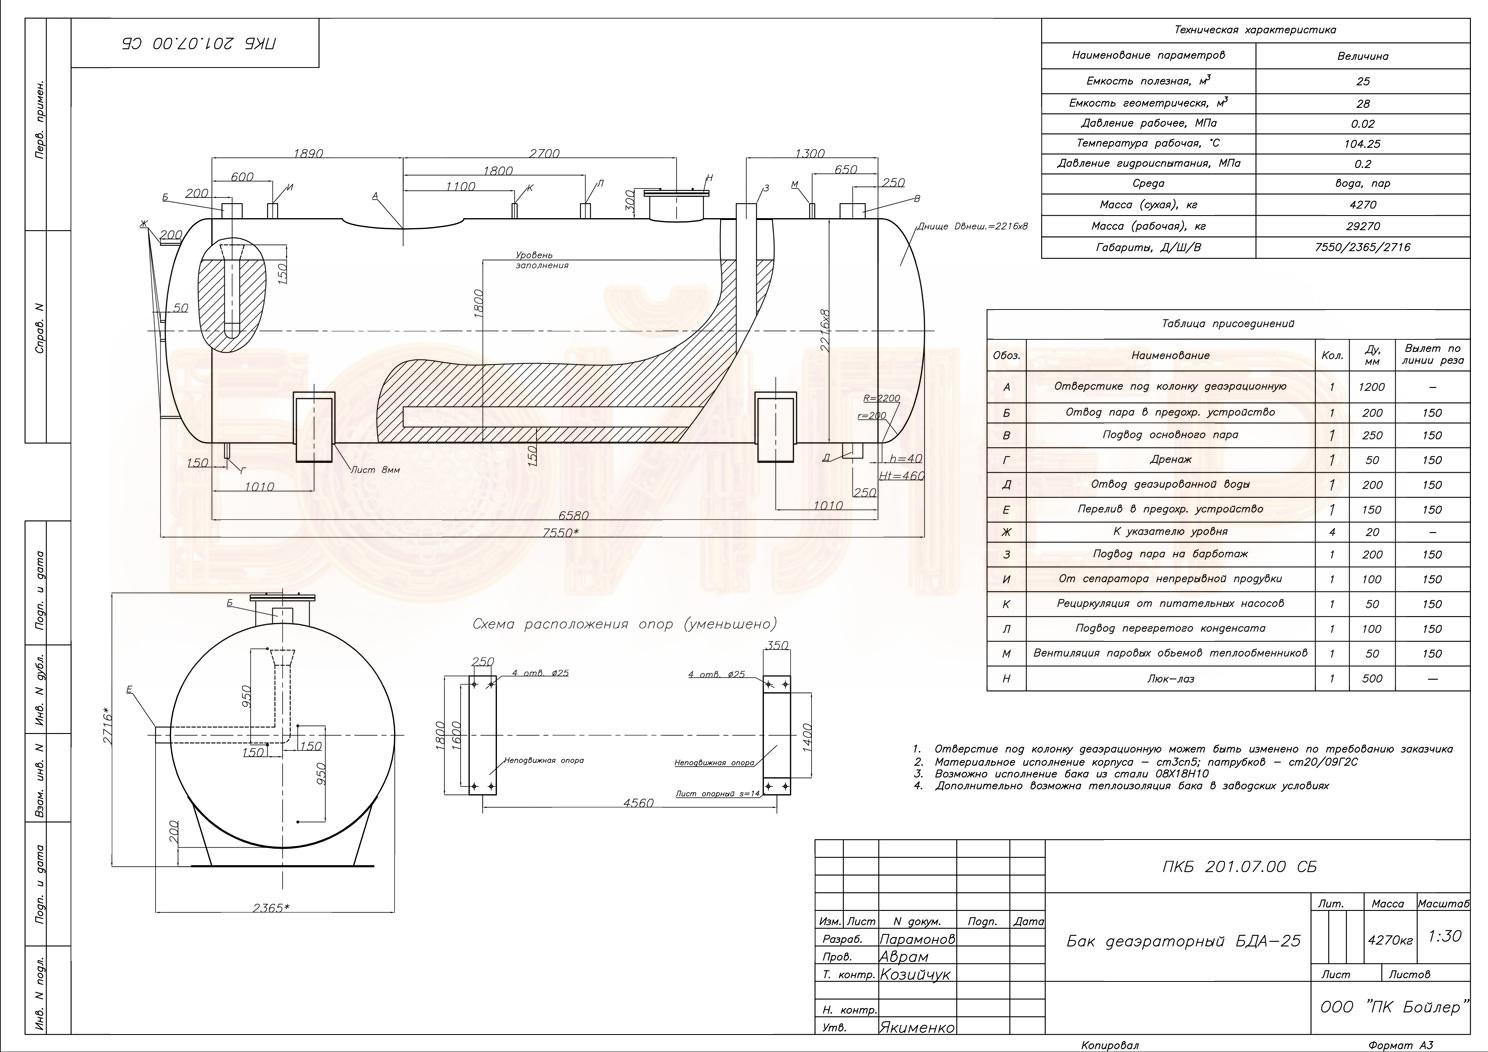 Кожухотрубный конденсатор ONDA M 315 Киров Пластины теплообменника Alfa Laval AQ8-FS Королёв